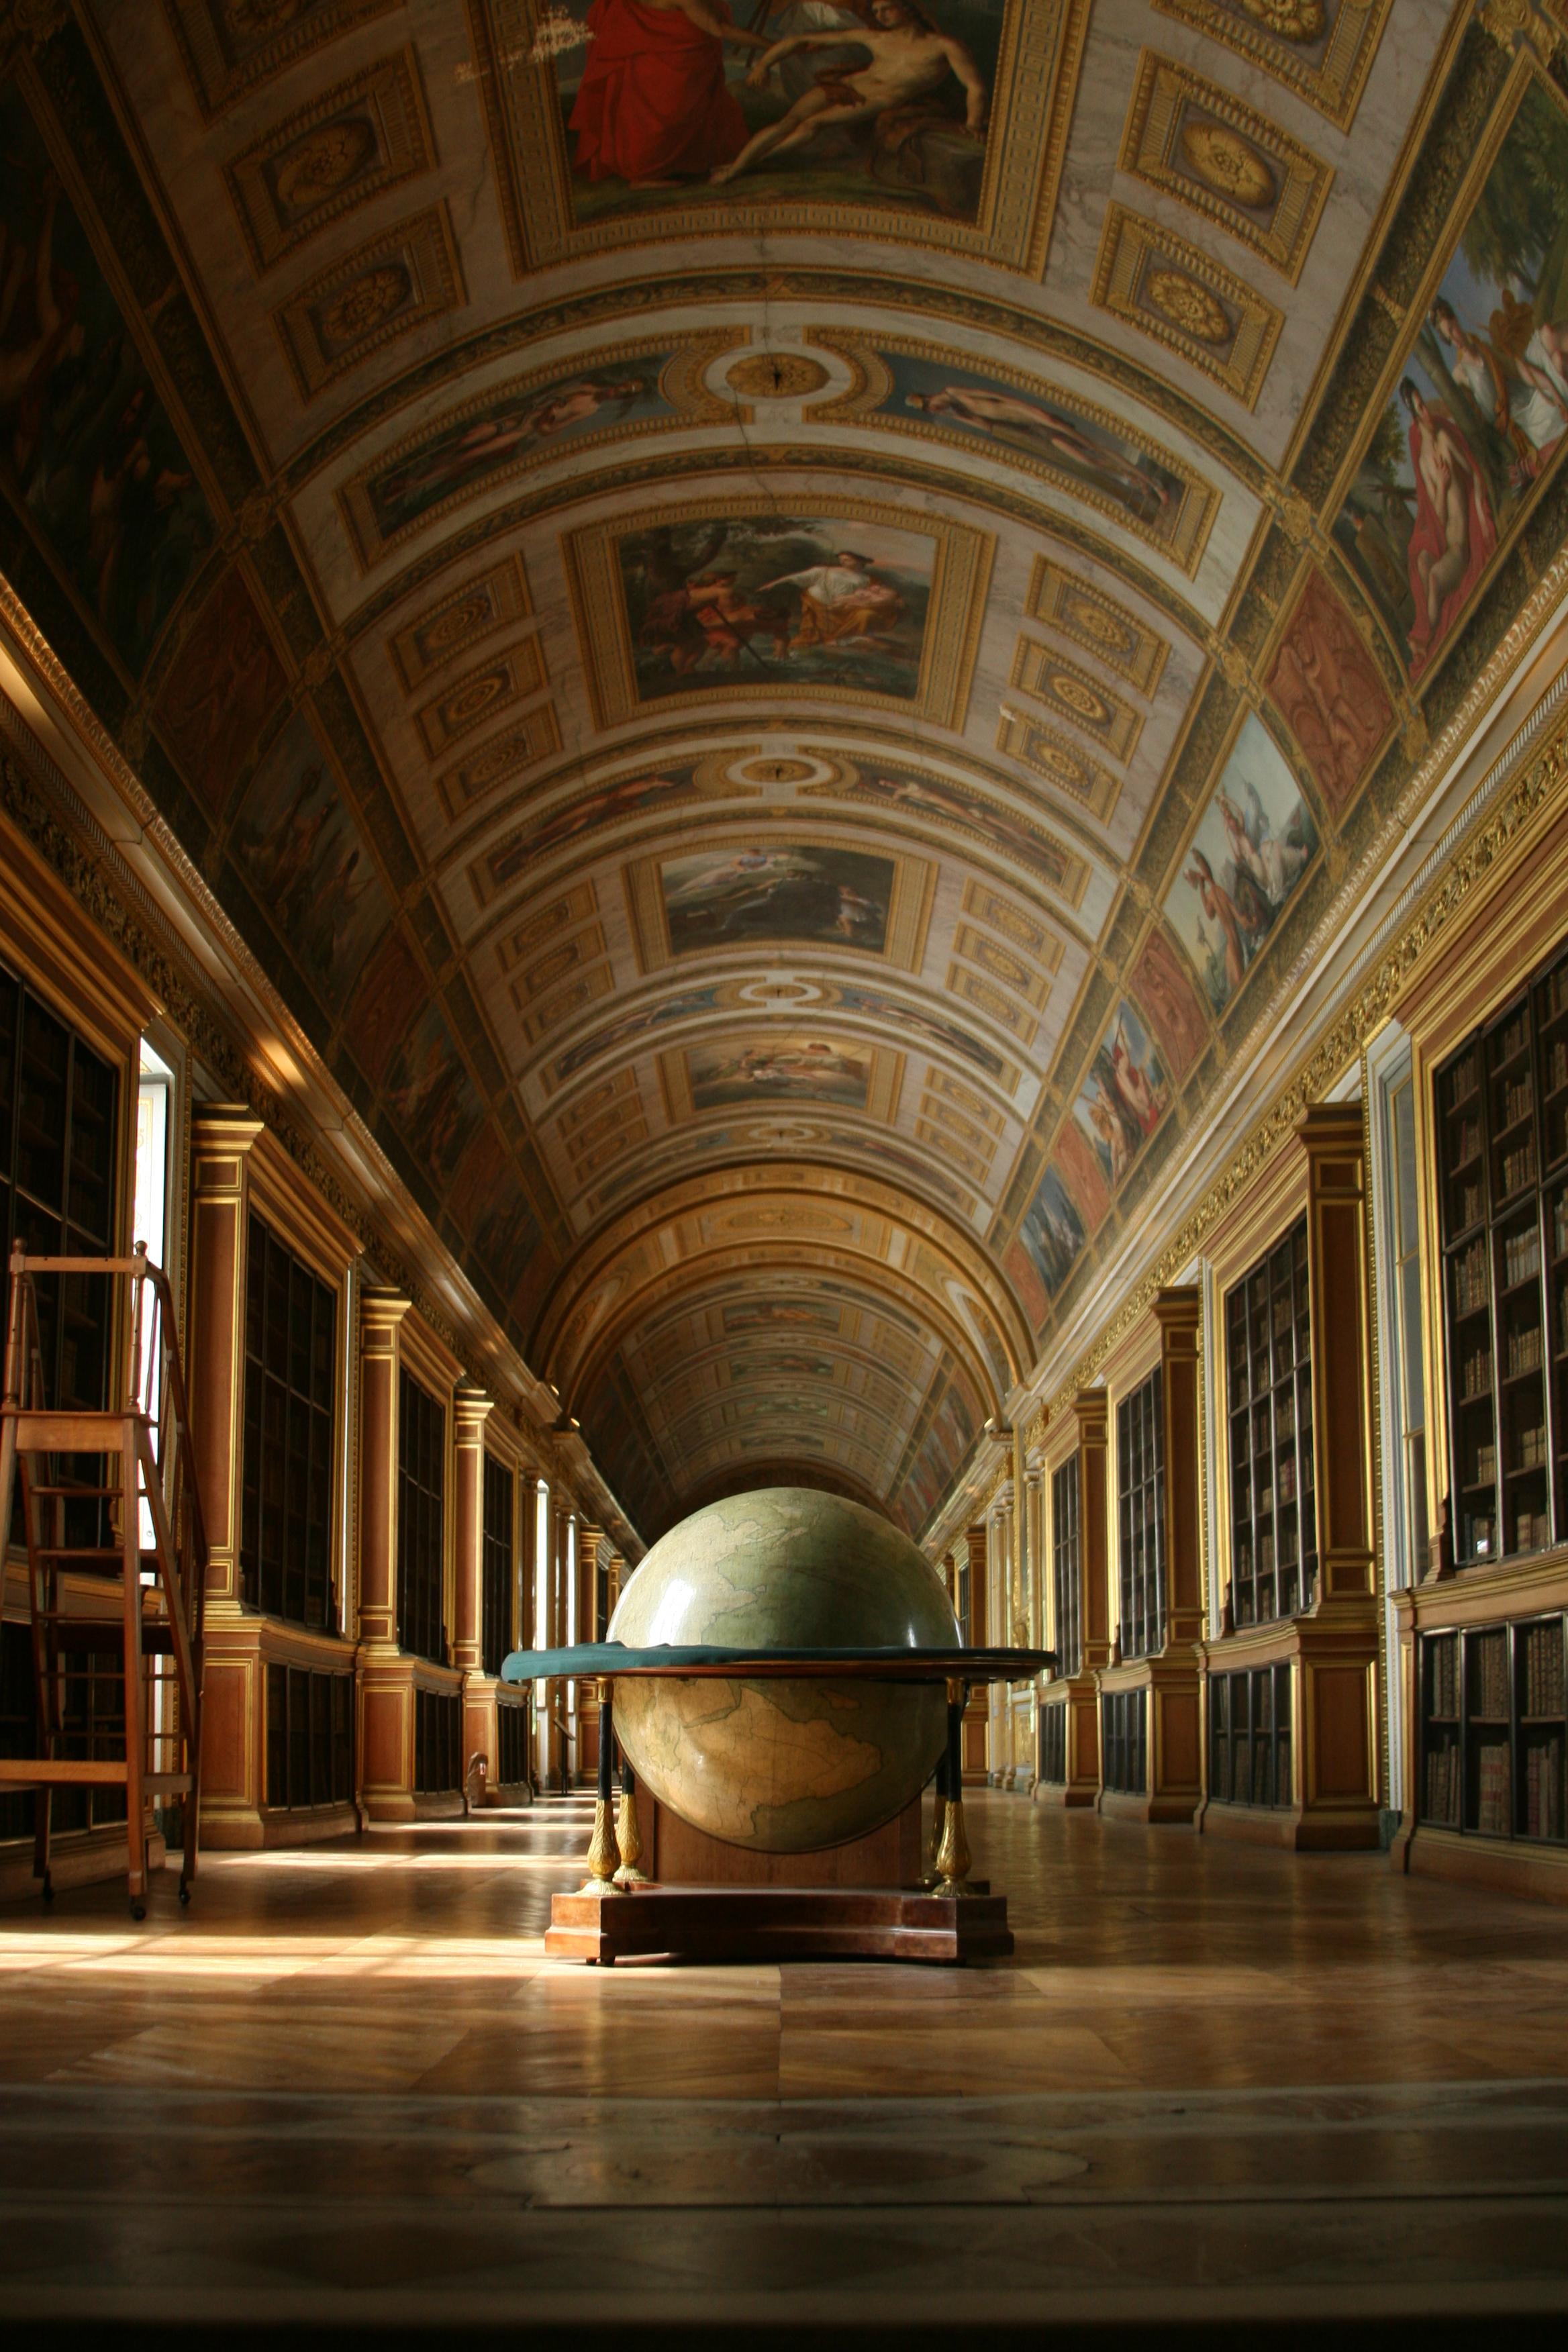 Palace of fontainebleau familypedia for Interieur francais